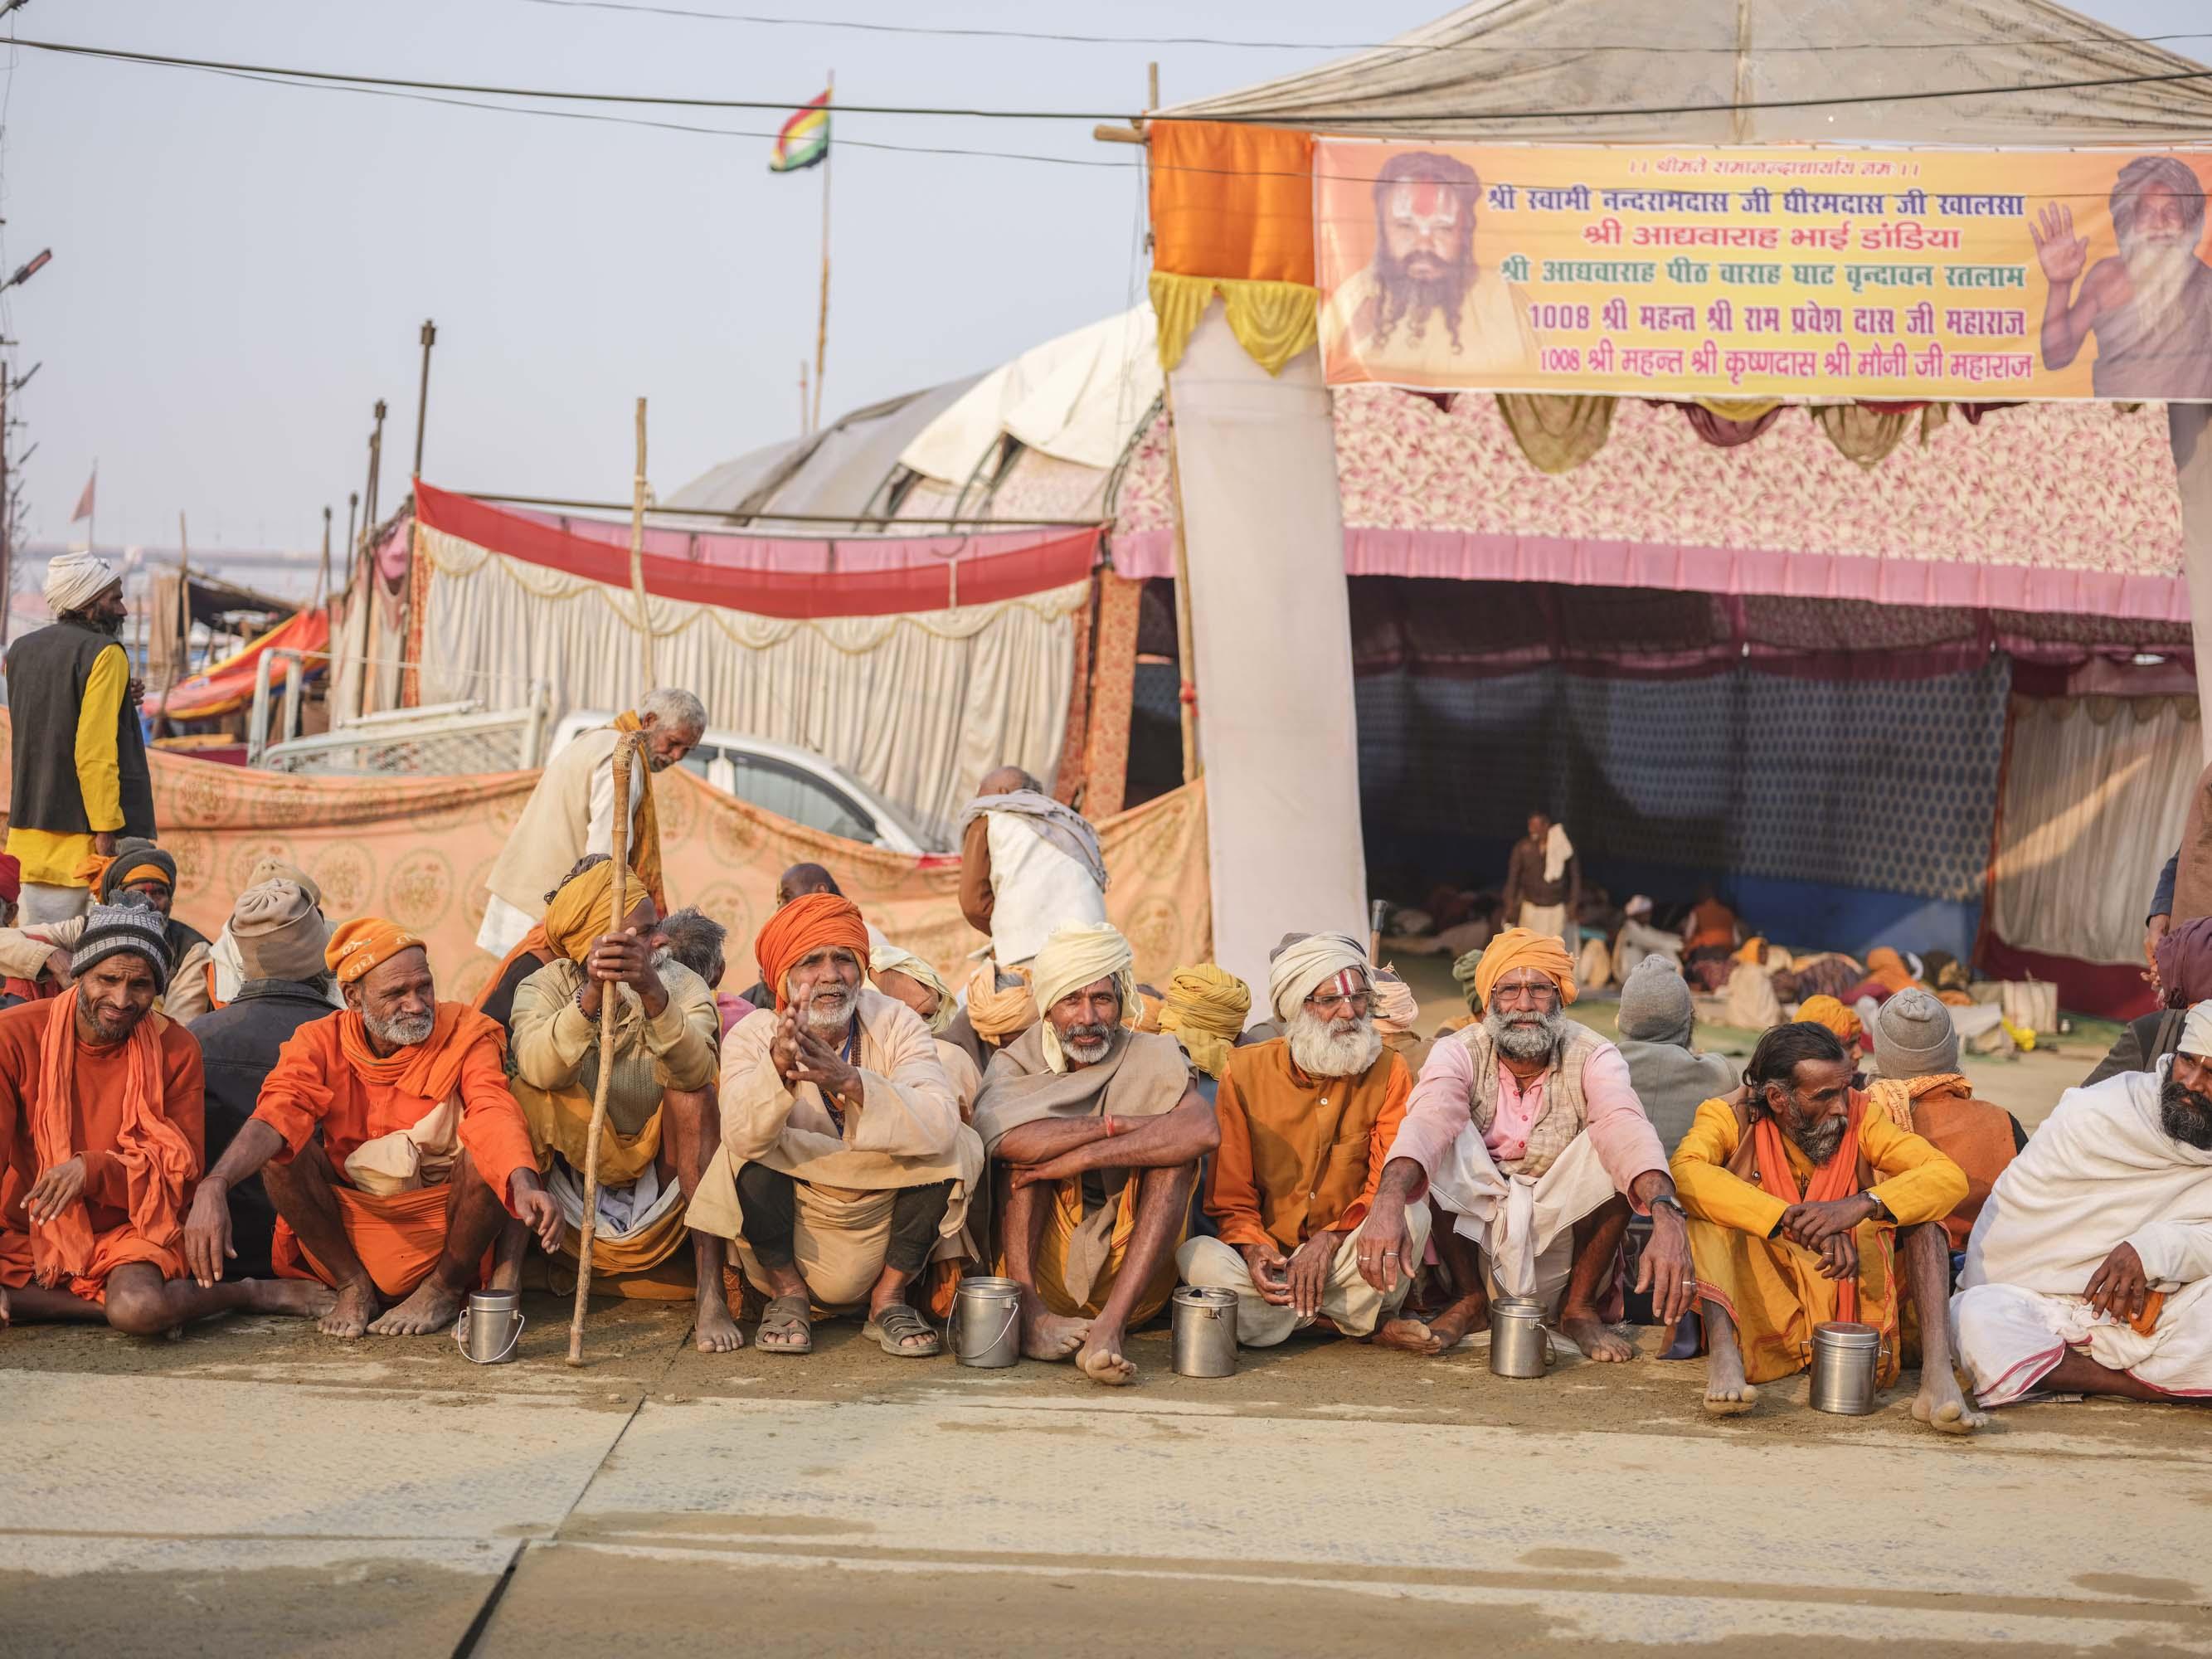 waiting for free food and mail camp pilgrims Kumbh mela 2019 India Allahabad Prayagraj Ardh hindu religious Festival event rivers photographer jose jeuland photography temple